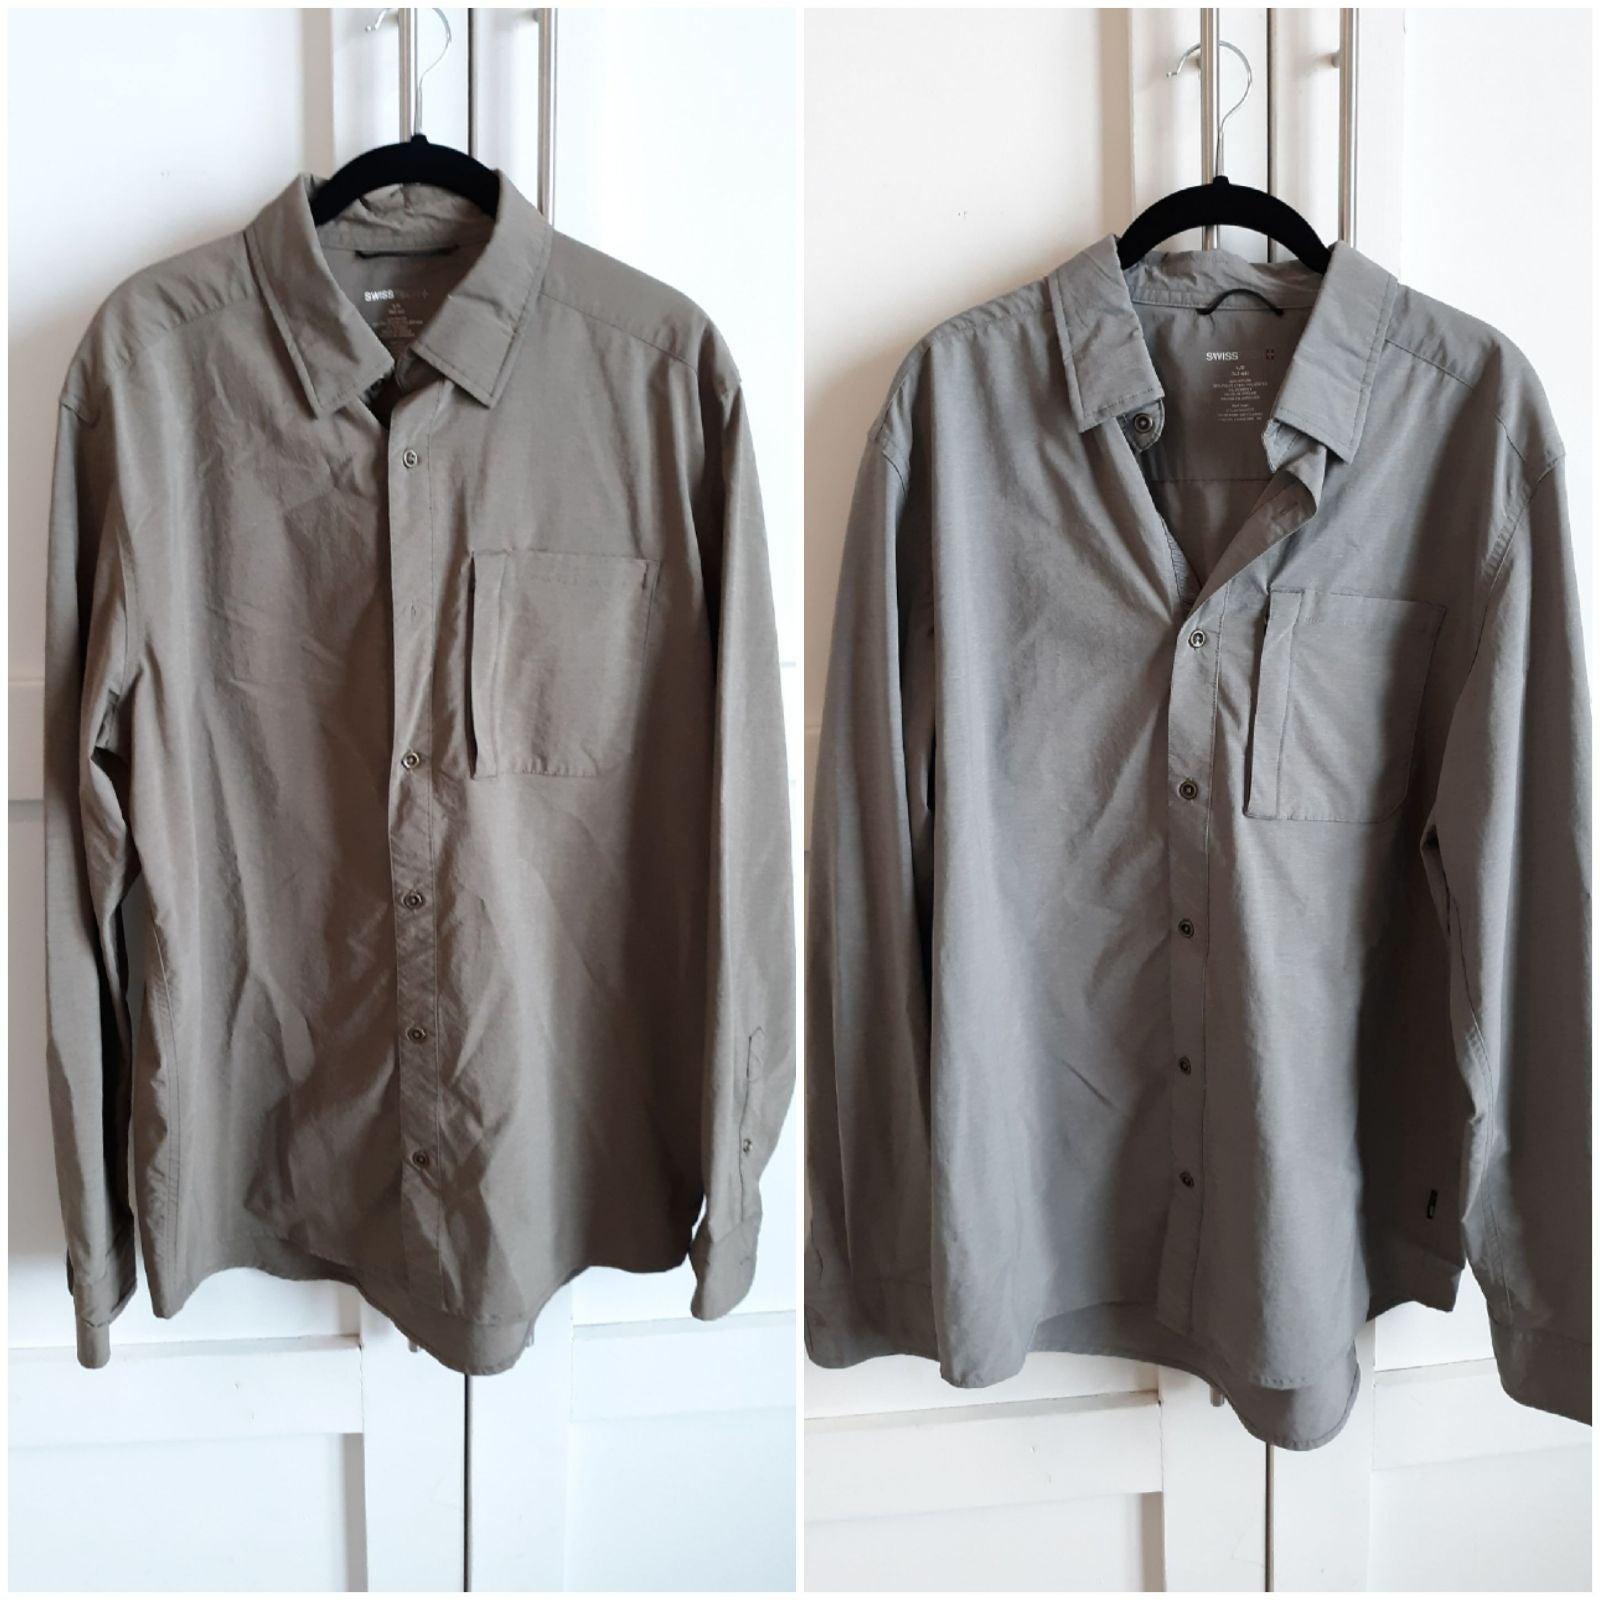 Bundle of mens work shirts